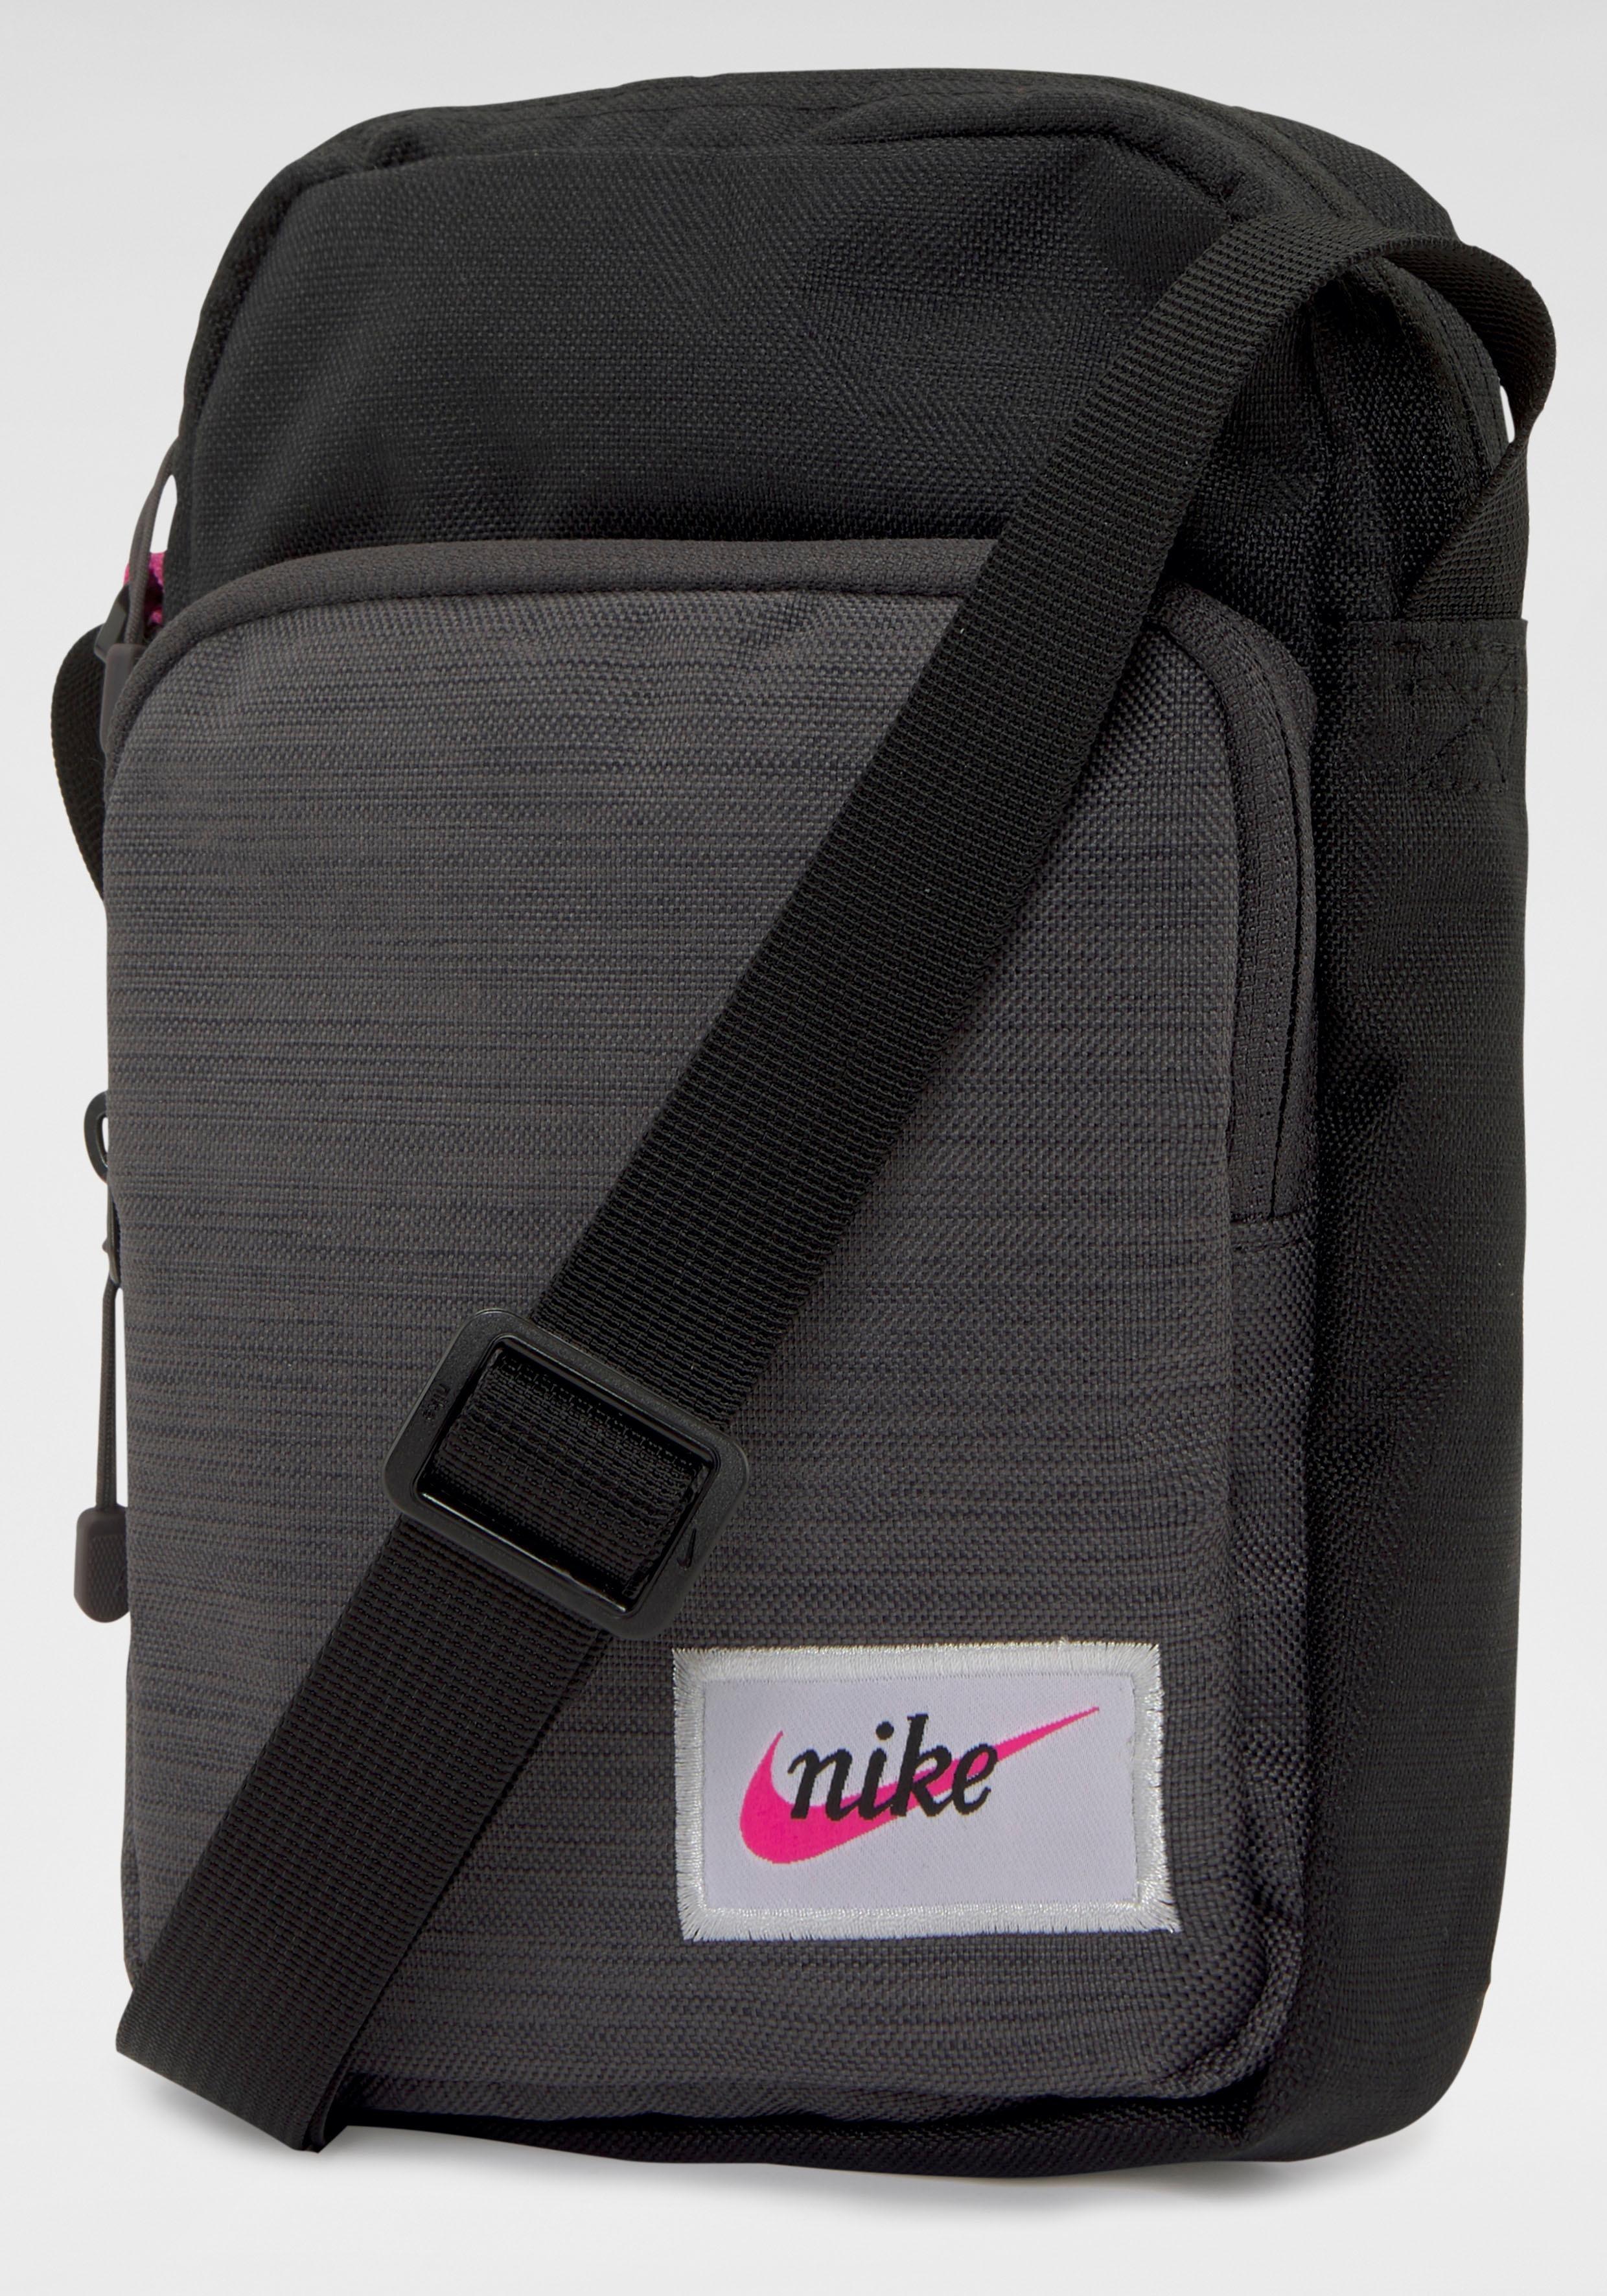 7e8d42e2f4 Nike Športová taška čierna - Glami.sk